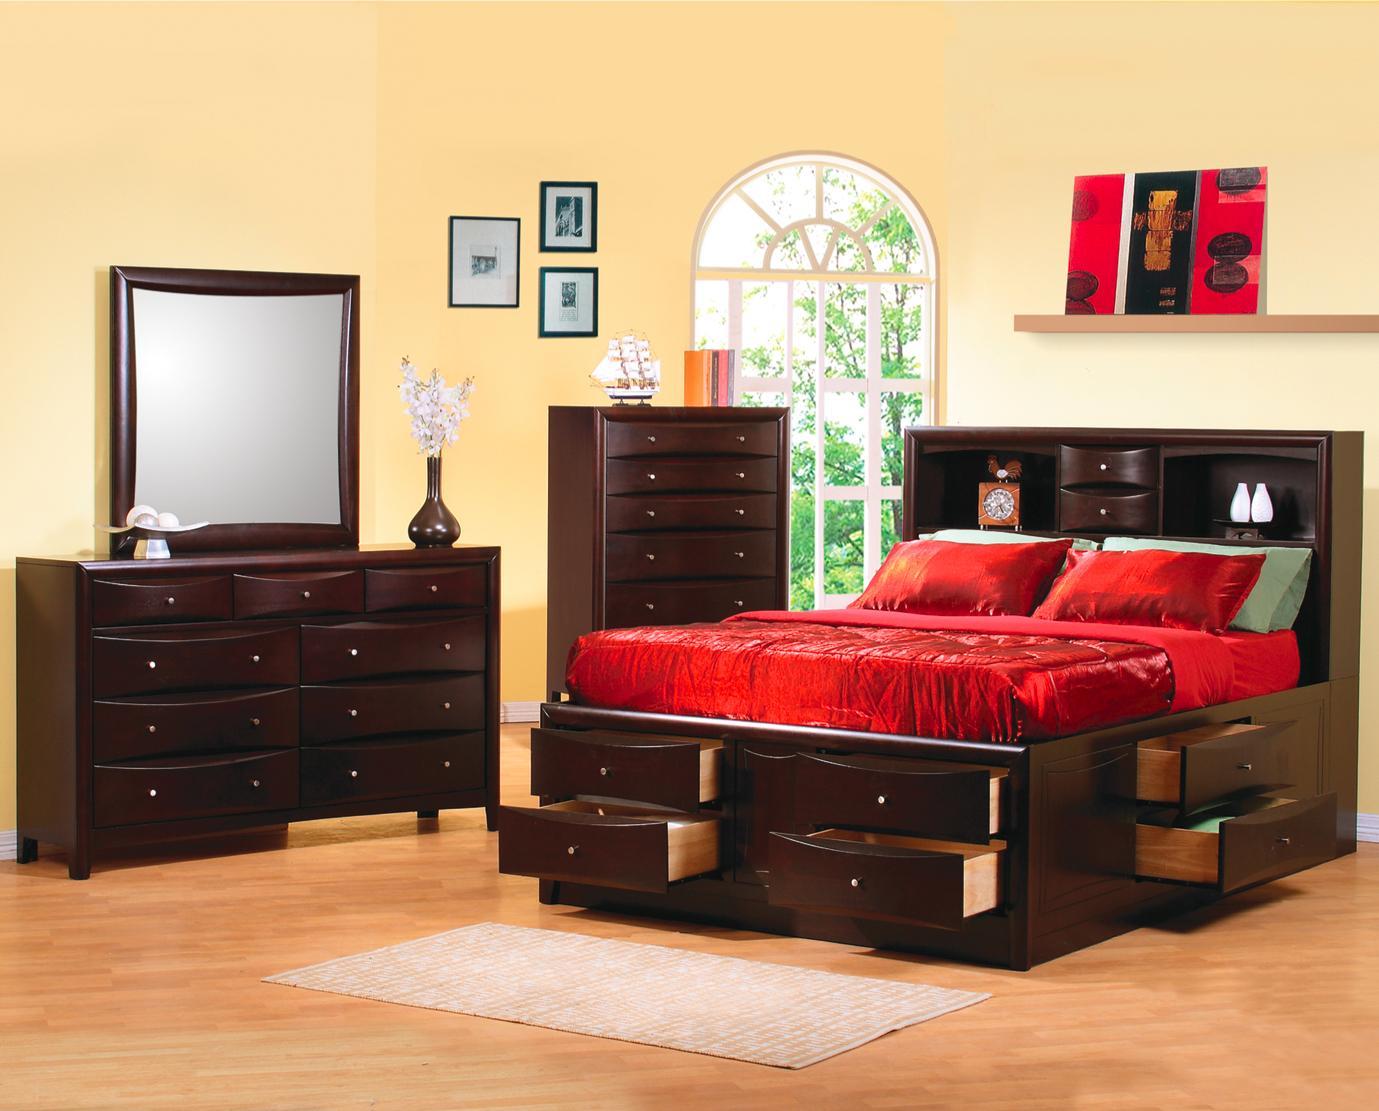 Coaster Furniture - Phoenix Bedroom Set | Broadway Furniture